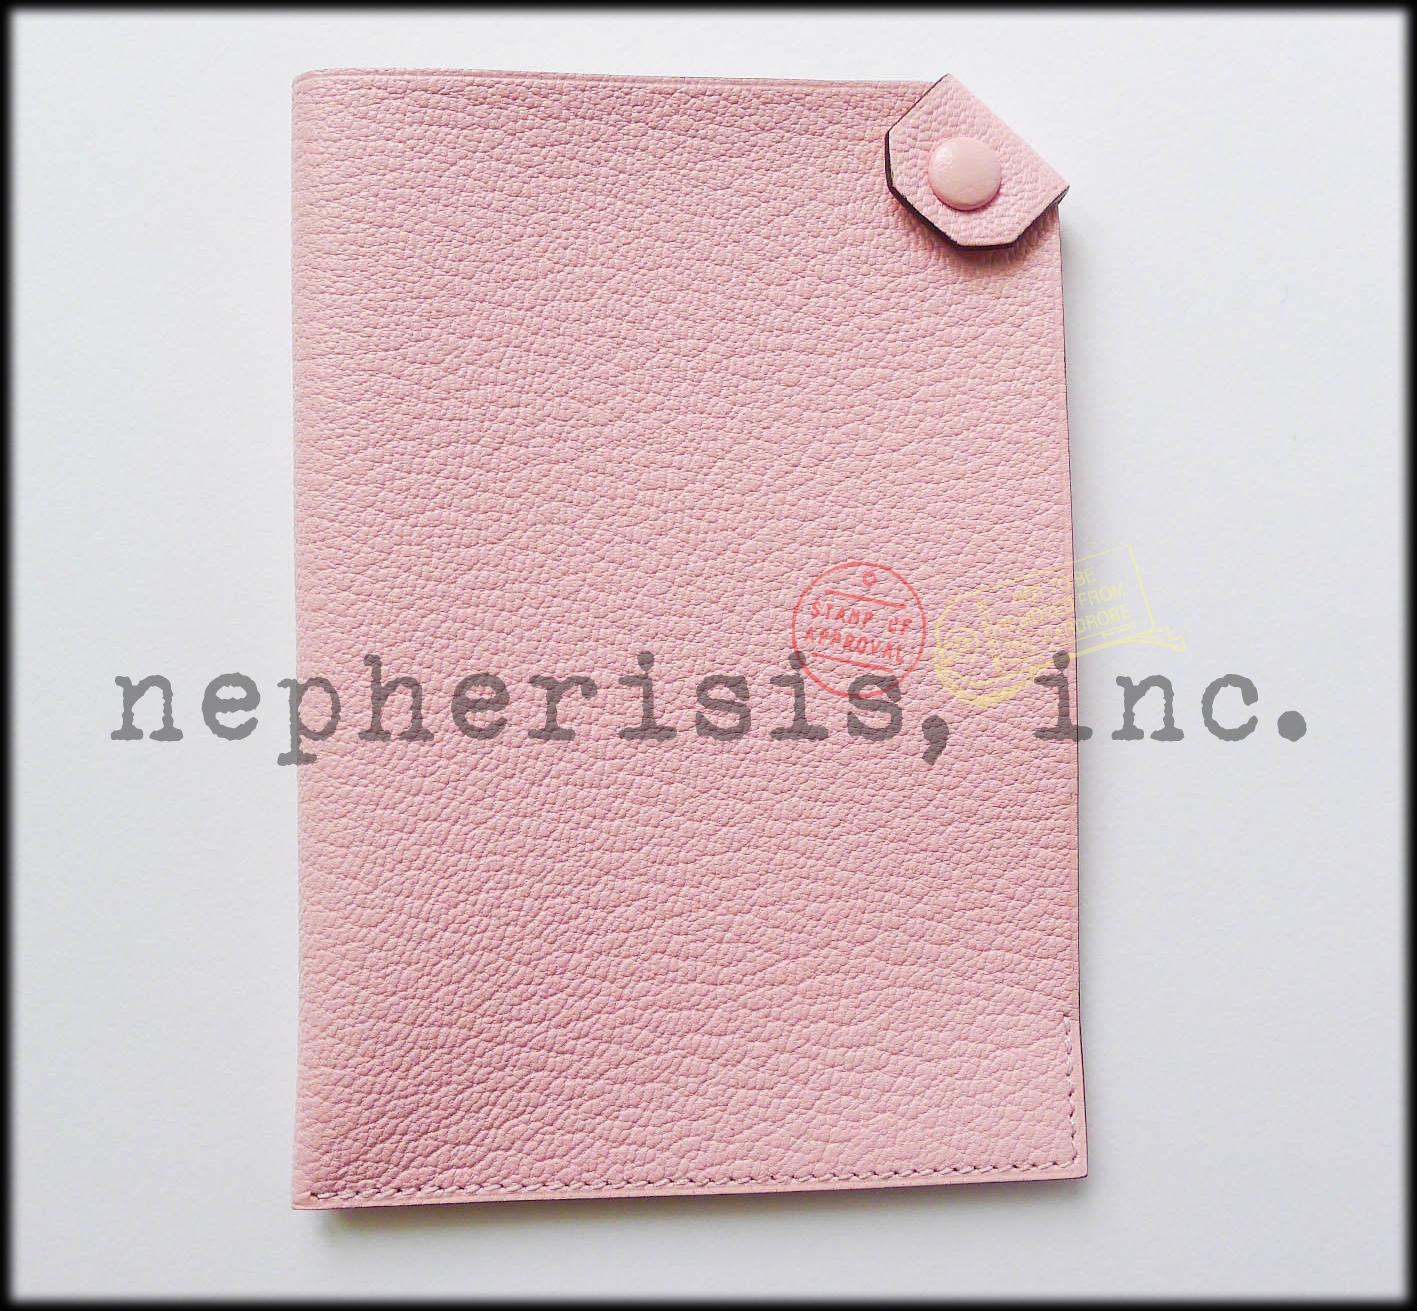 AUTH BNIB Hermes TARMAC PM Passport Holder or Cover in Pink Chevre ROSE SAKURA image 4